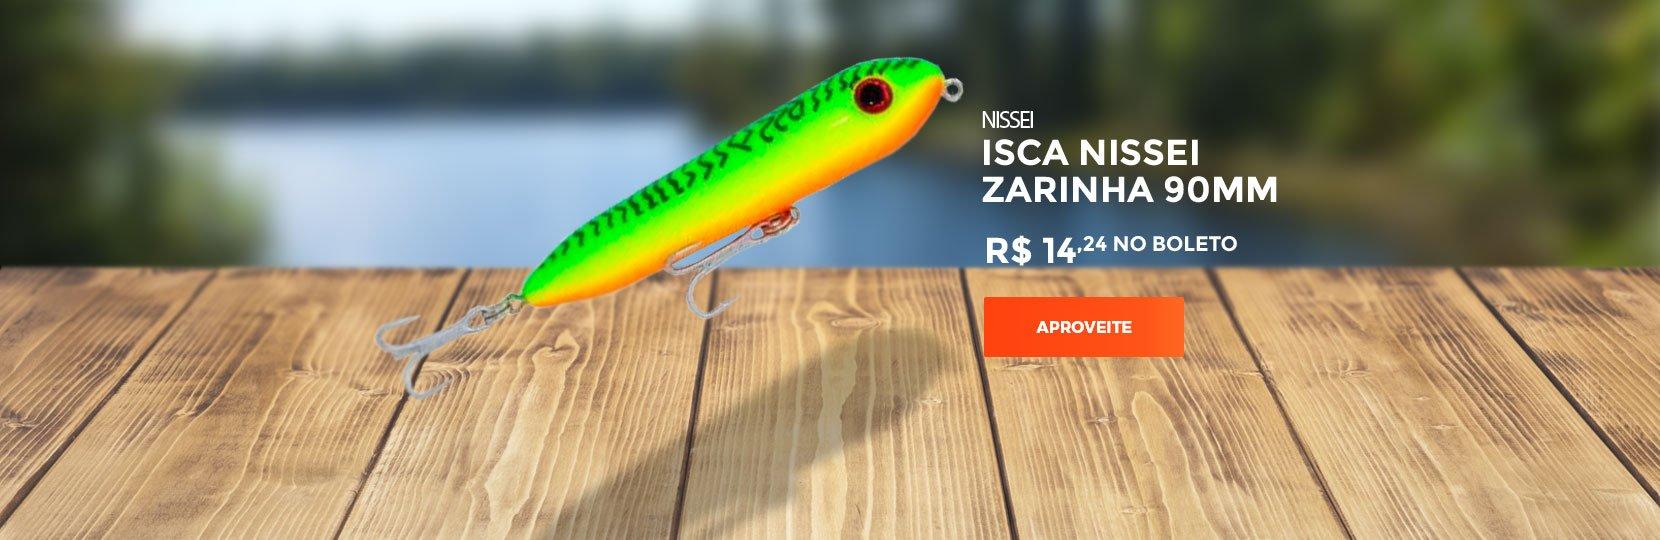 Zarinha Banner